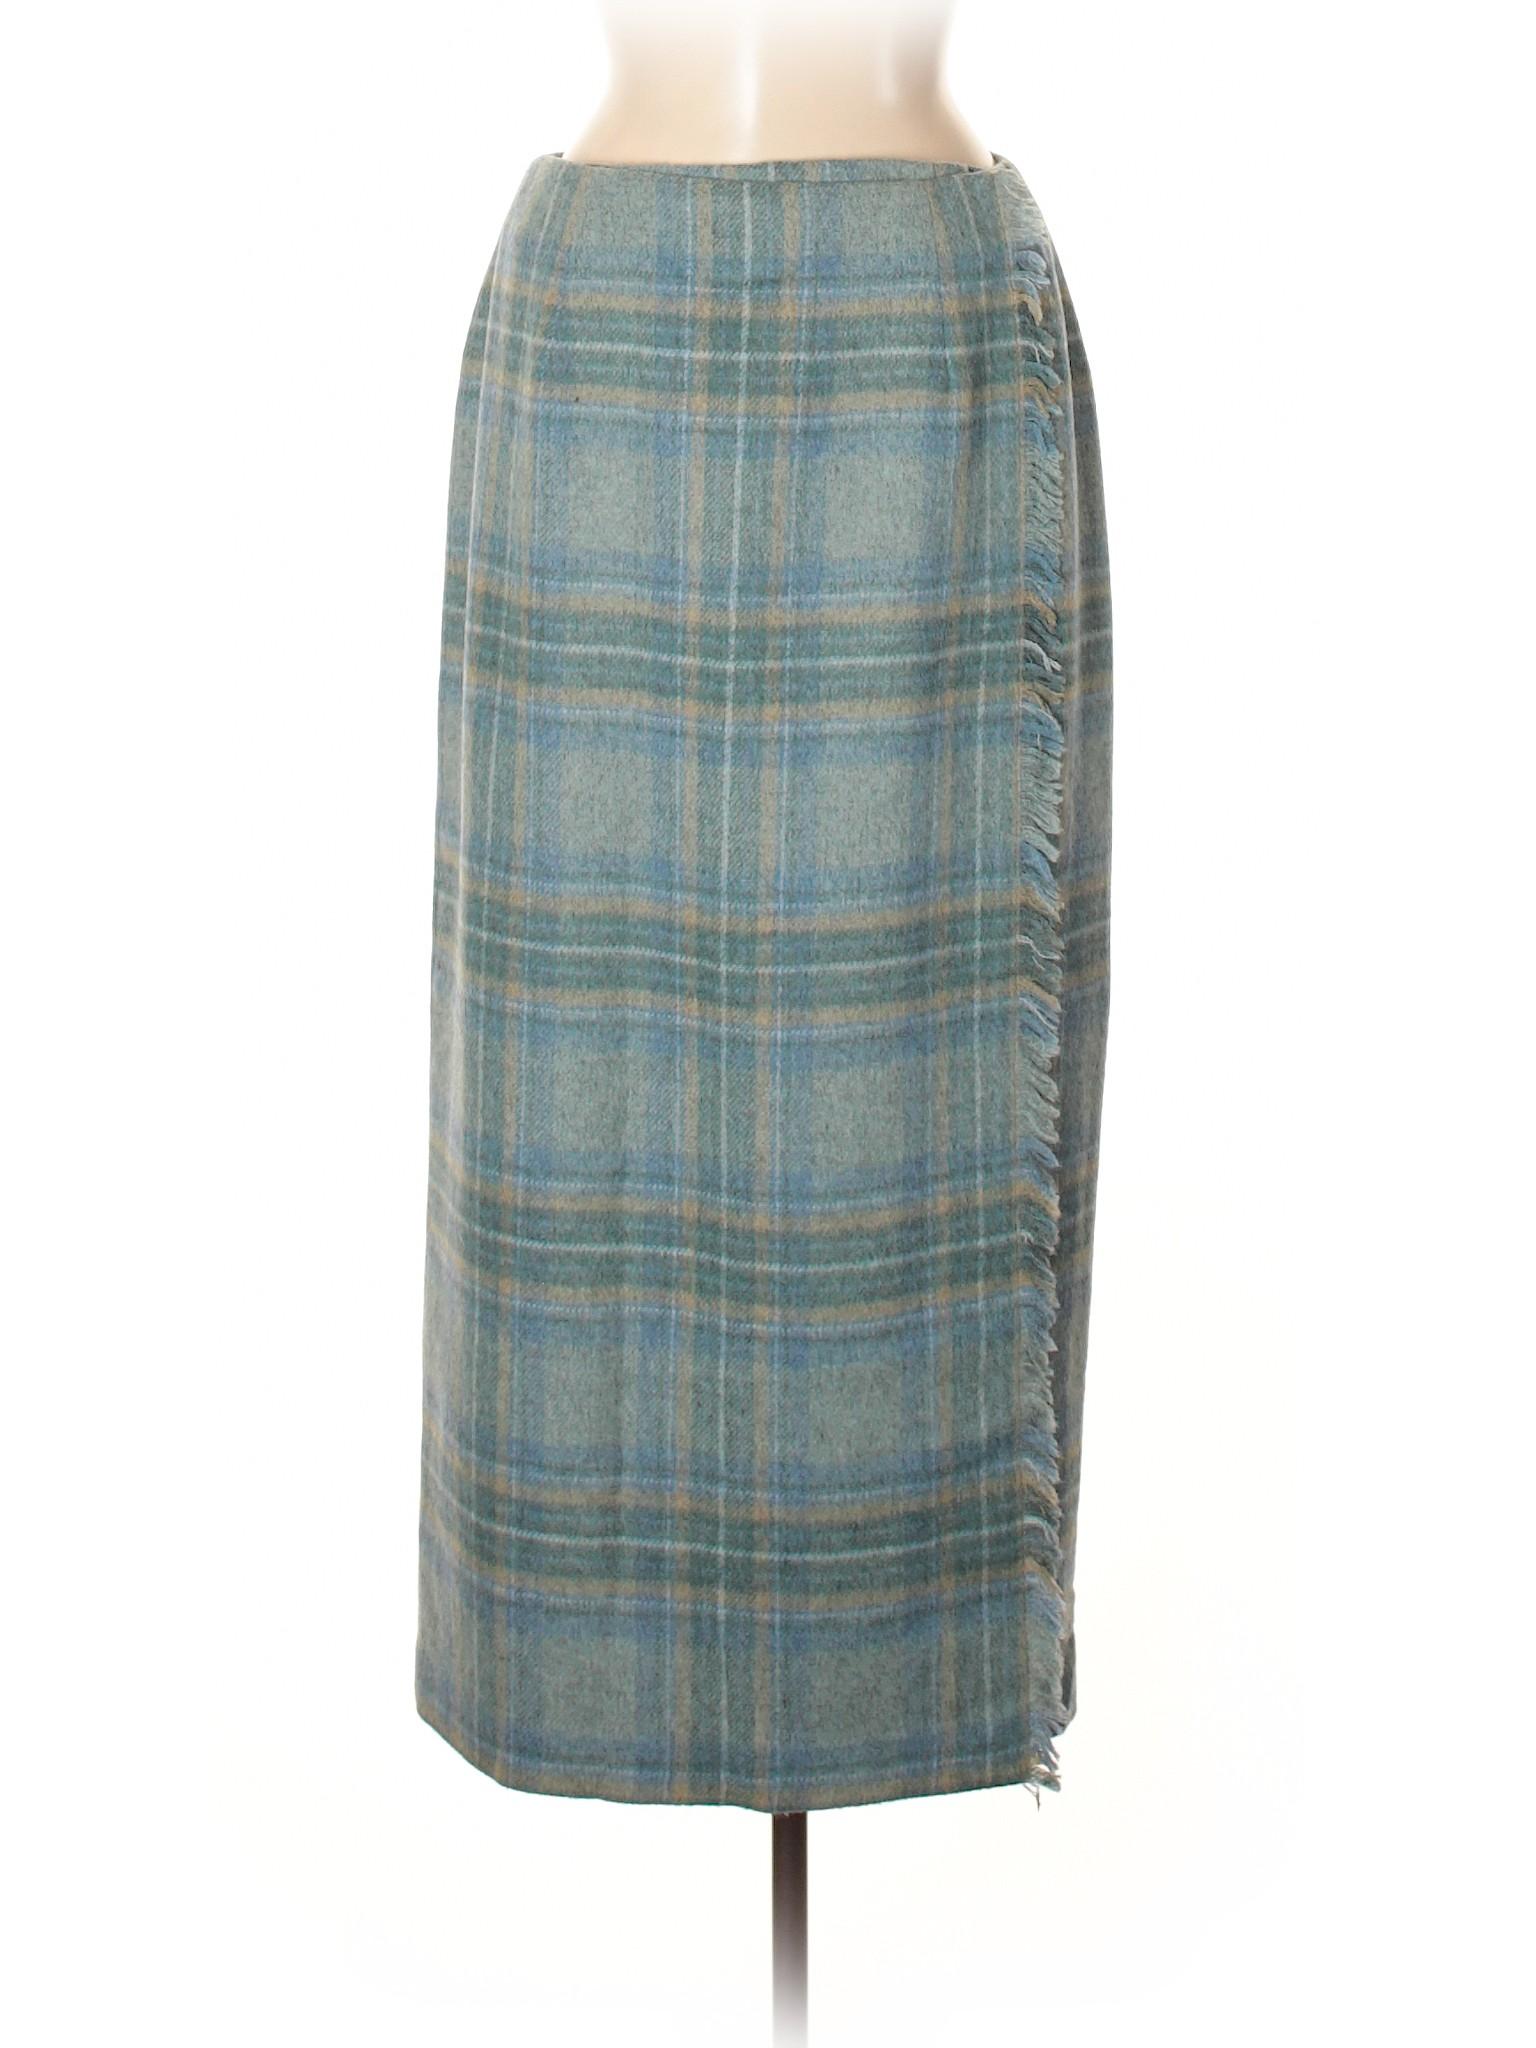 Boutique Boutique Wool Skirt Wool Boutique Wool Boutique Skirt Skirt Wool Skirt TdUgg